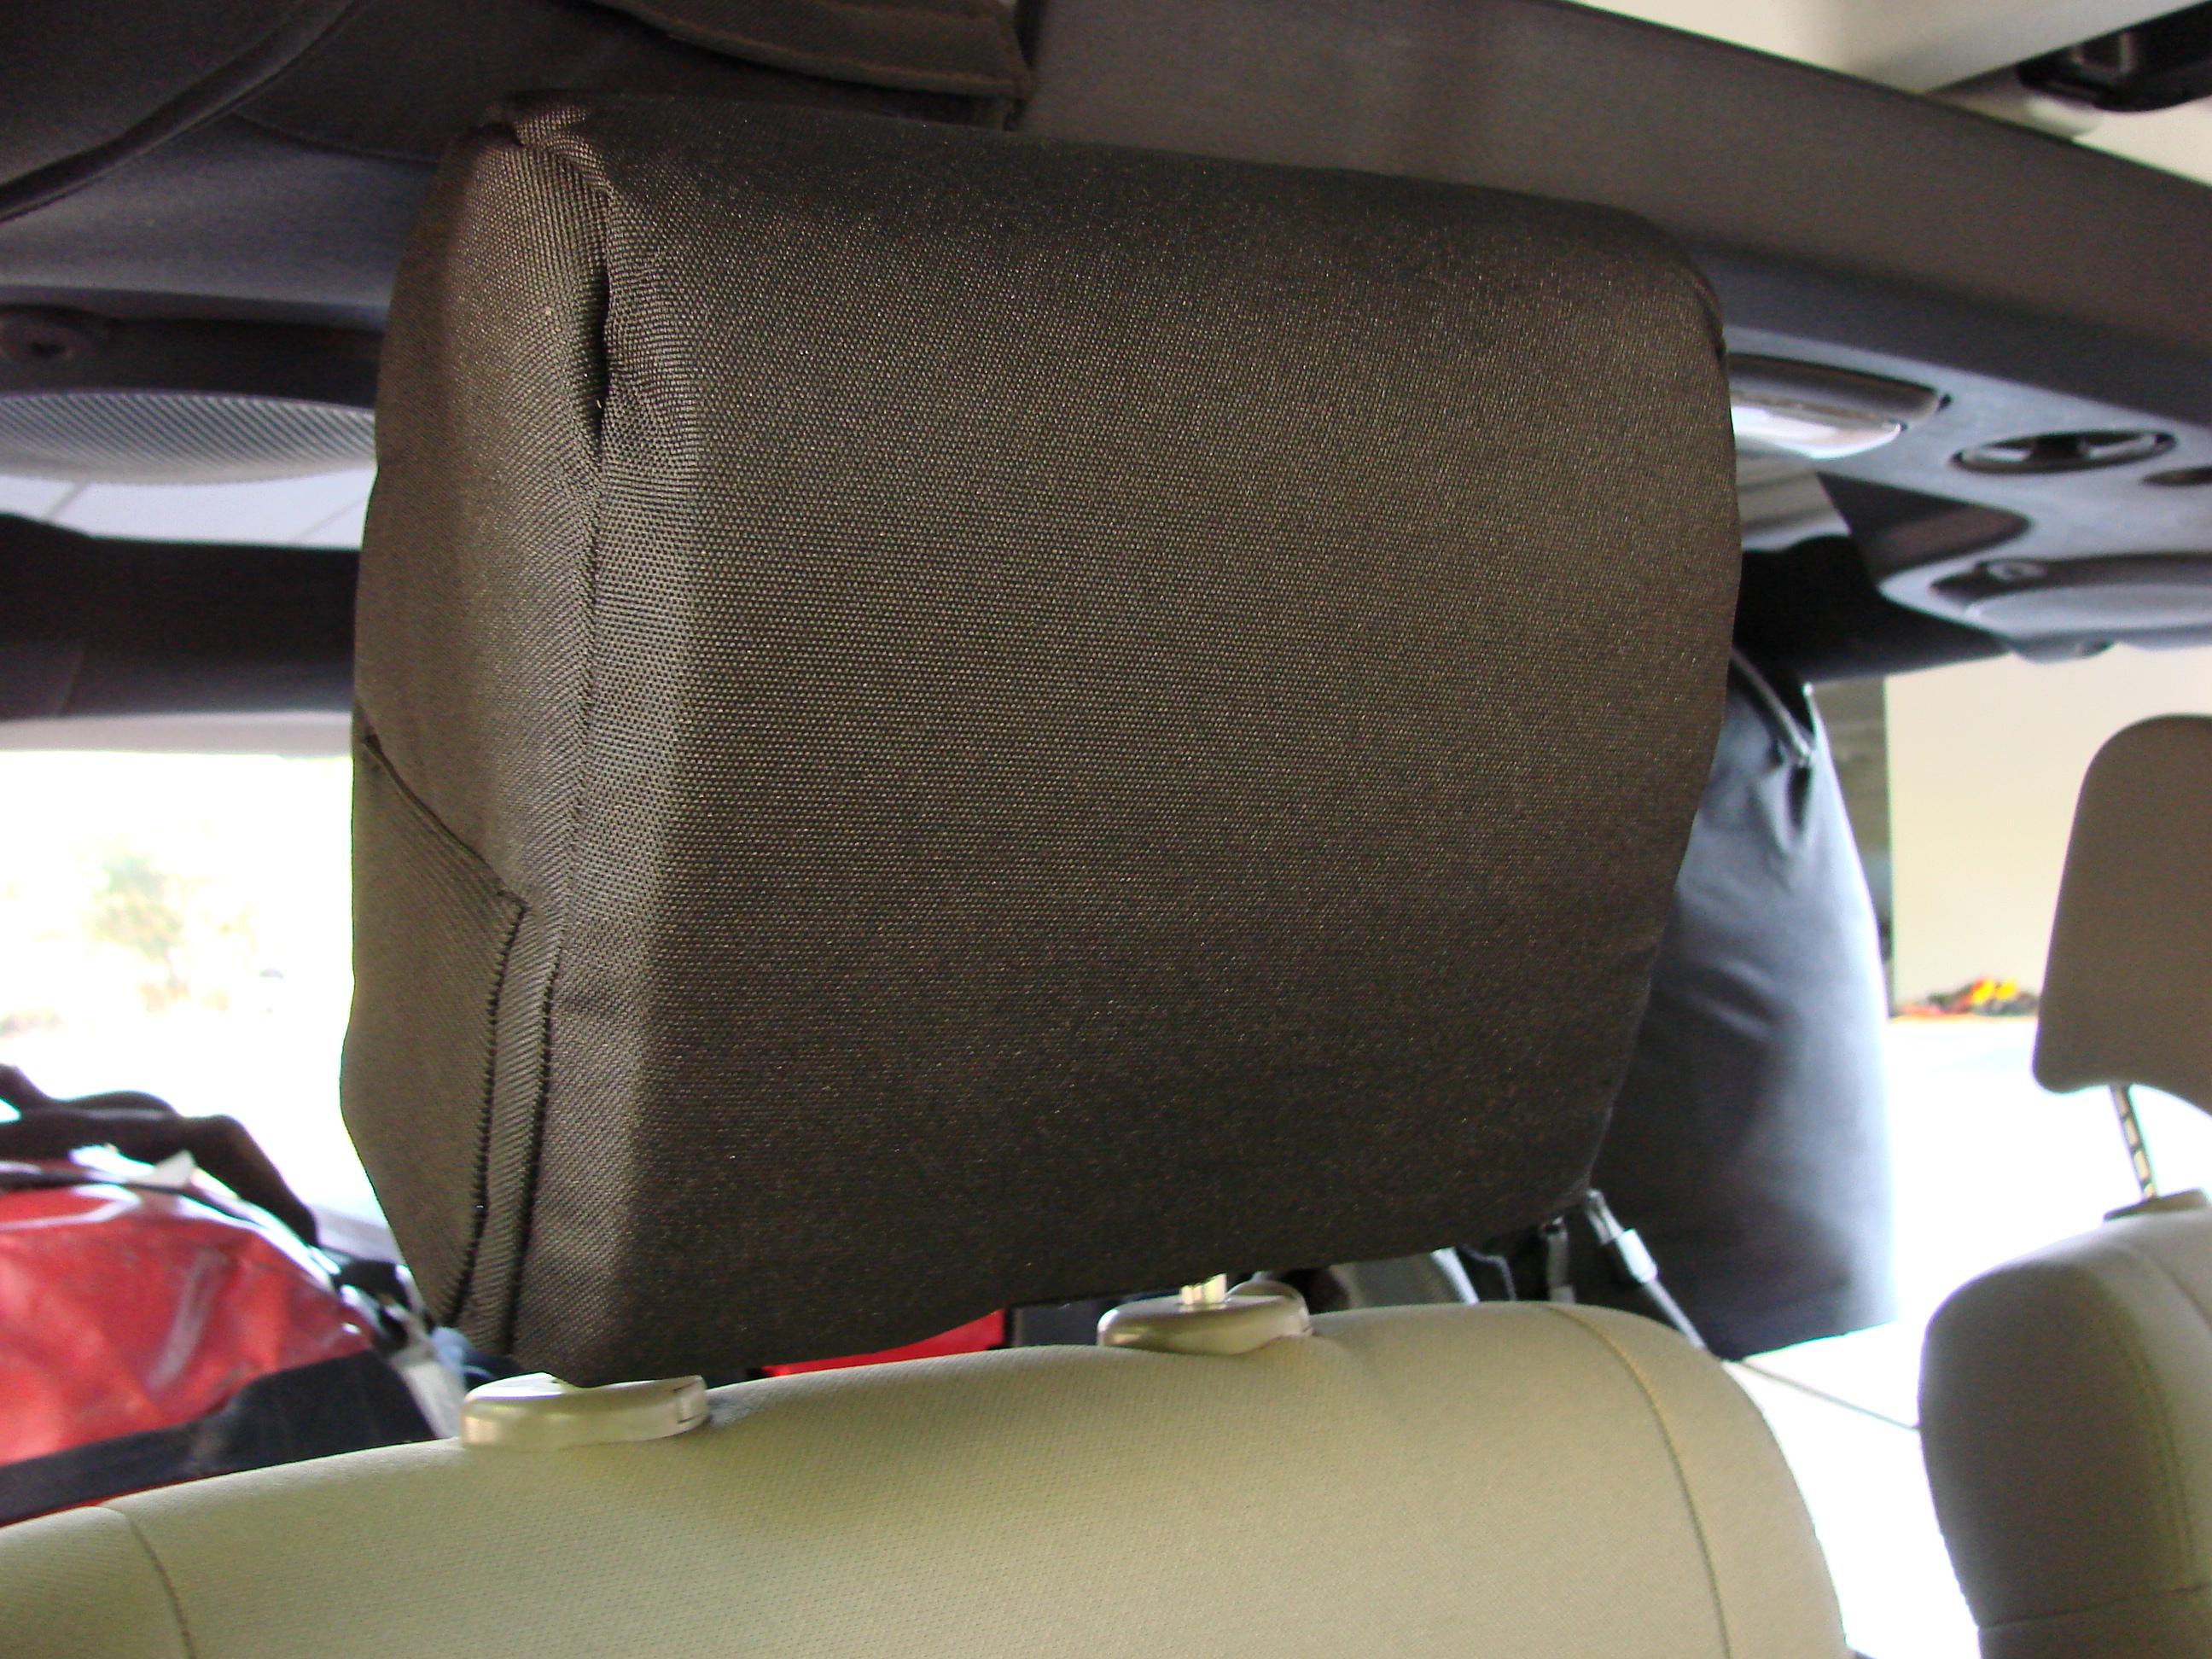 The Misch head rest pad installed